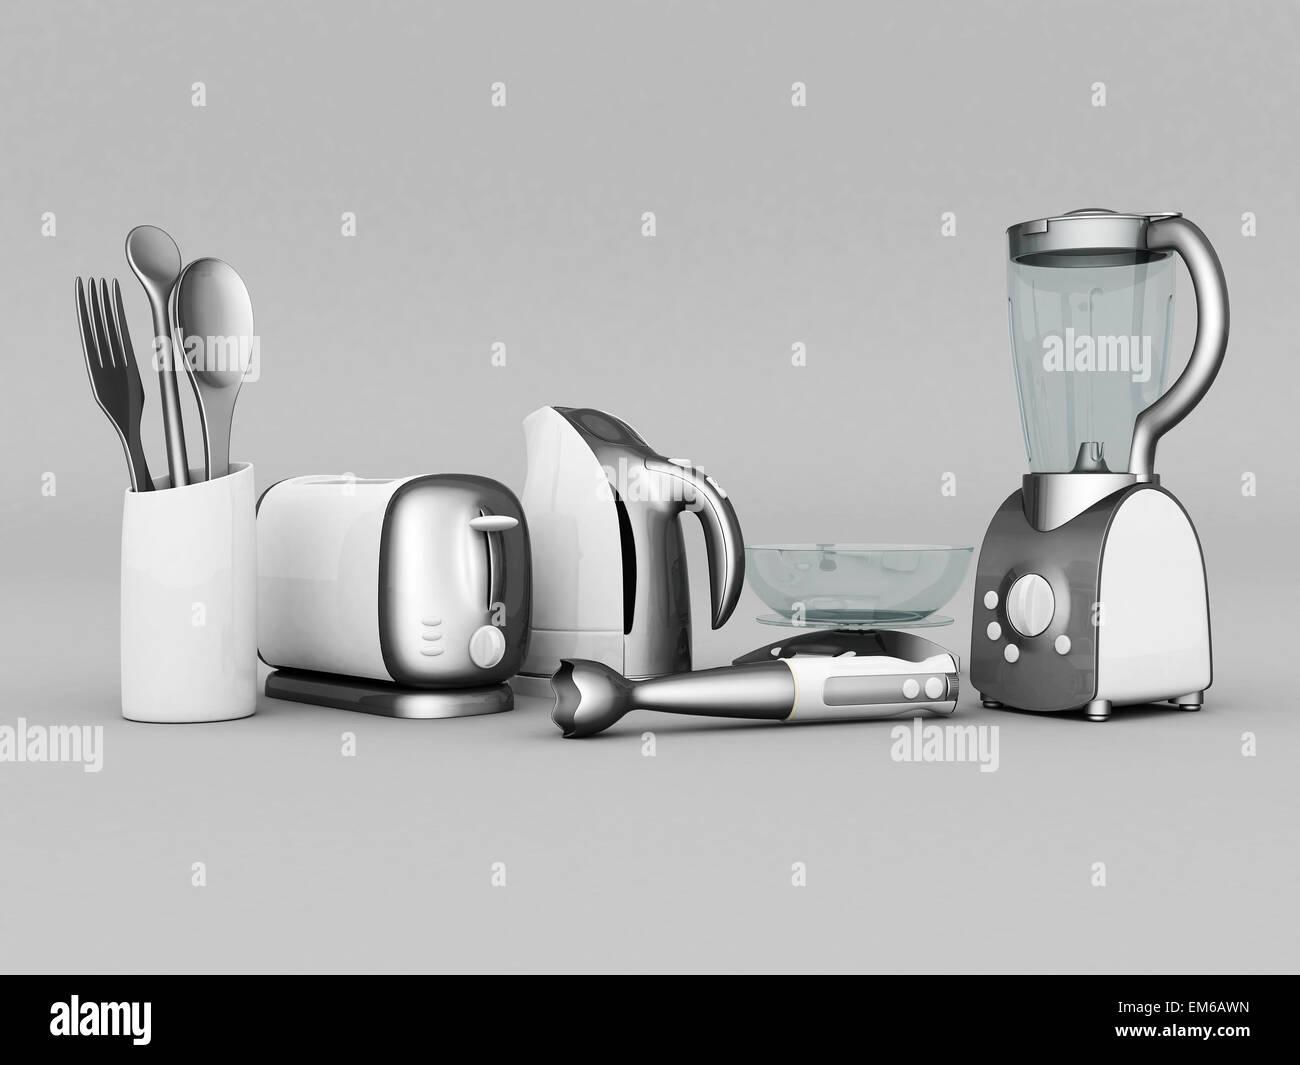 household appliances - Stock Image